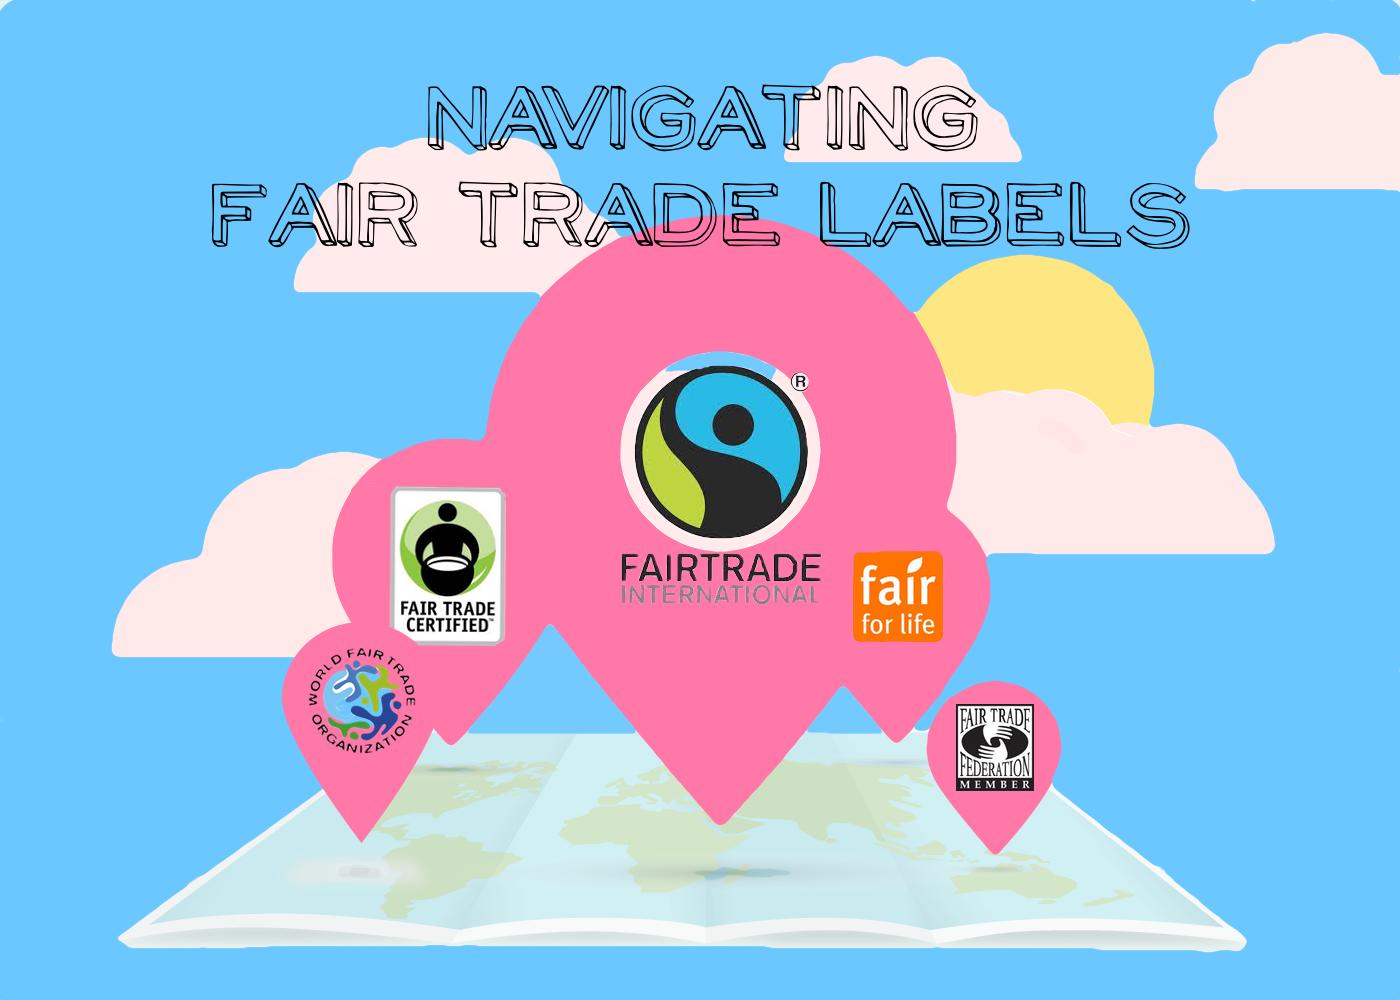 fair-trade-labels-pic2.png